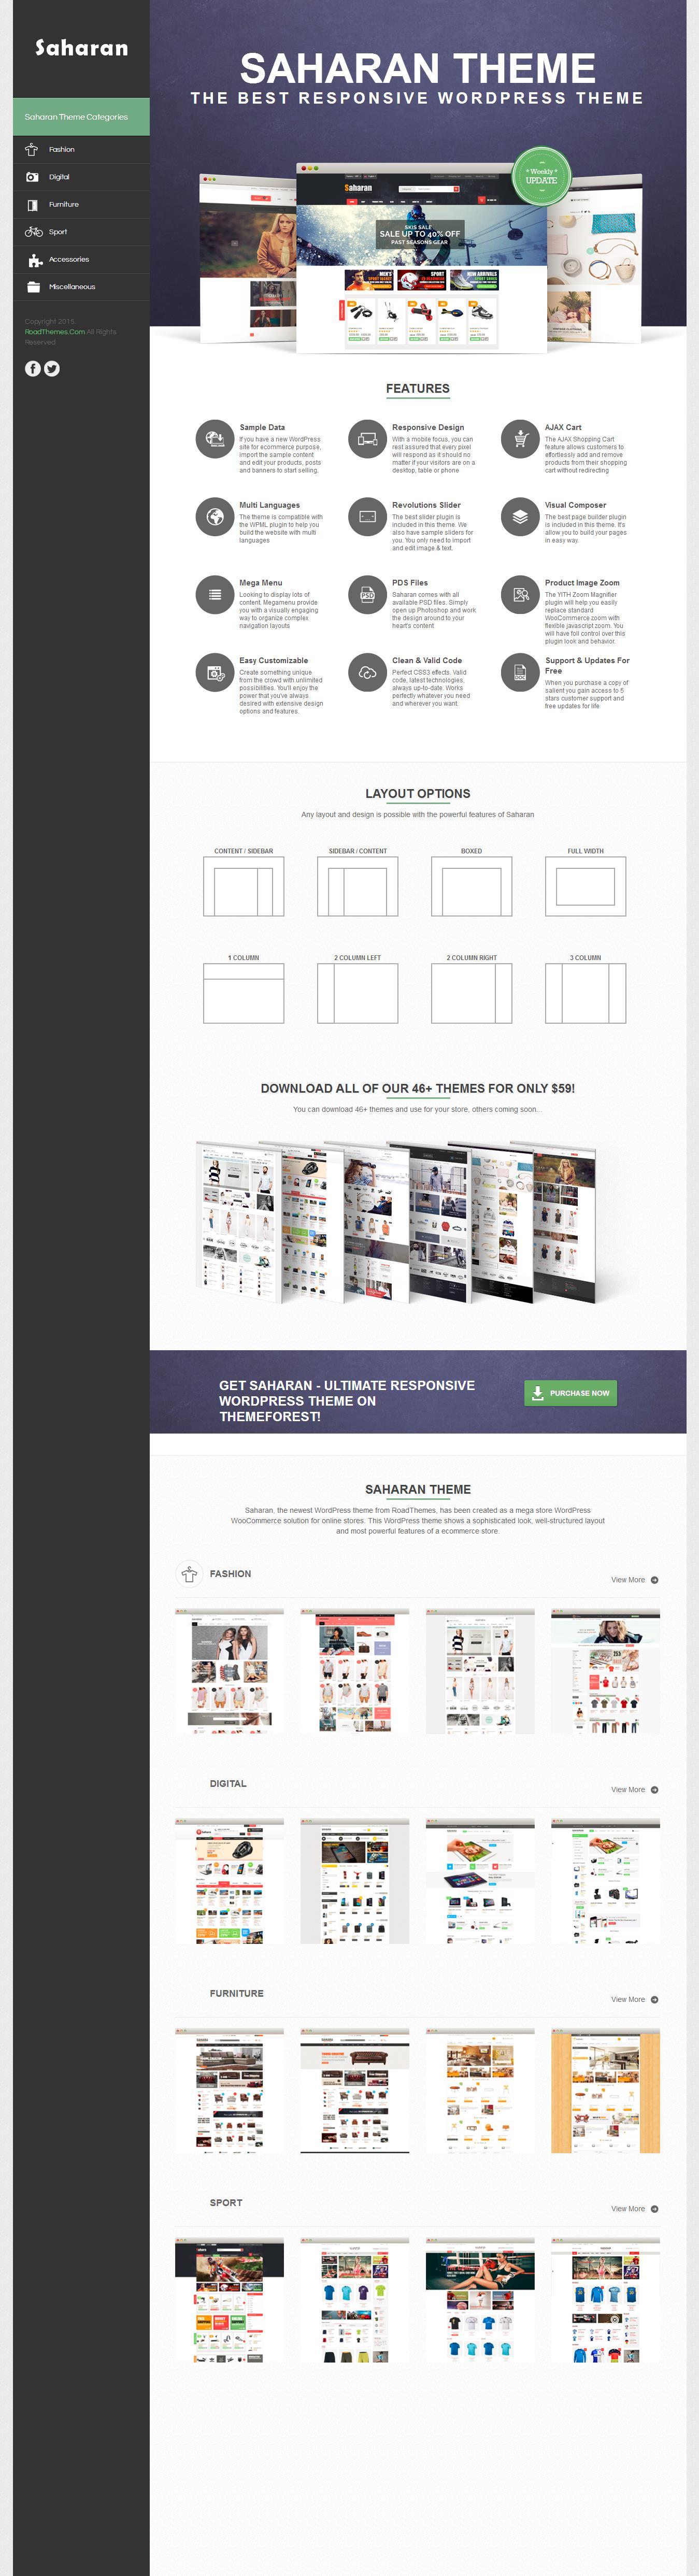 saharan-ultimate-responsive-wordpress-theme-fashion-wordpress-theme-furniture-responsive-wordpress-theme-clothing-responsive-wordpress-theme-sport-wordpress-theme-mobile-store-wordpress-theme